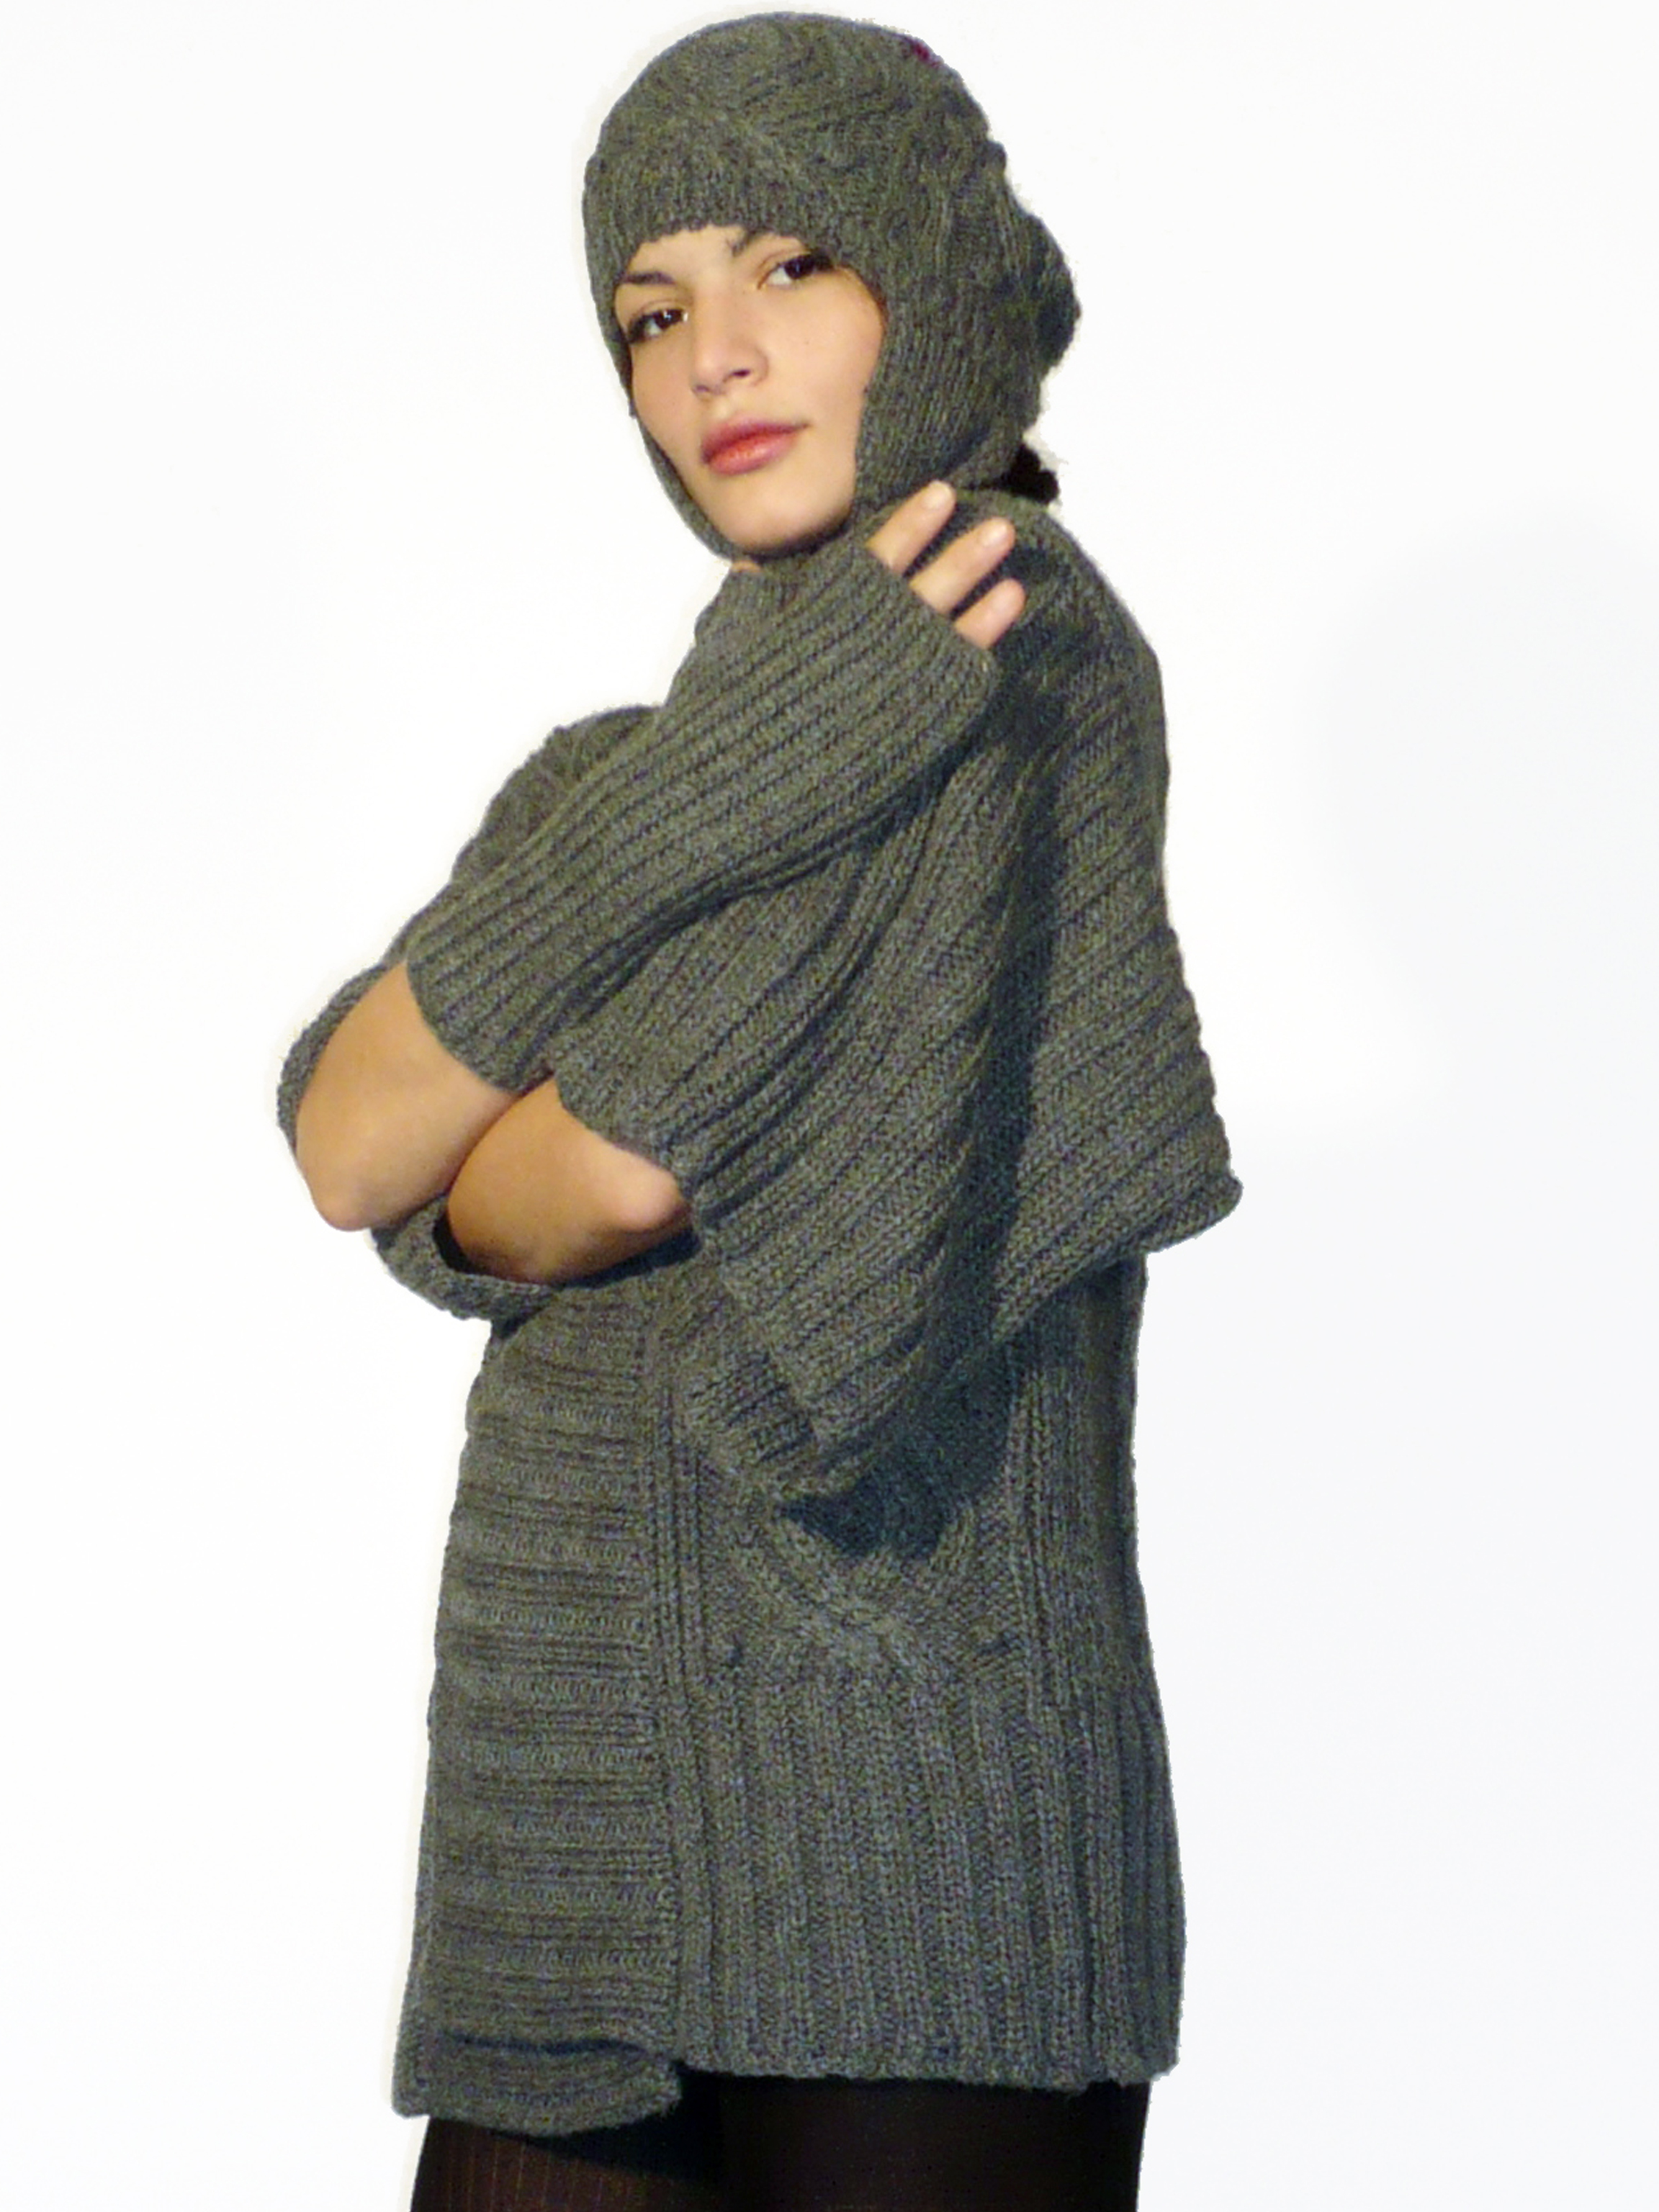 marie-auniac-design-alpaga-nature-37